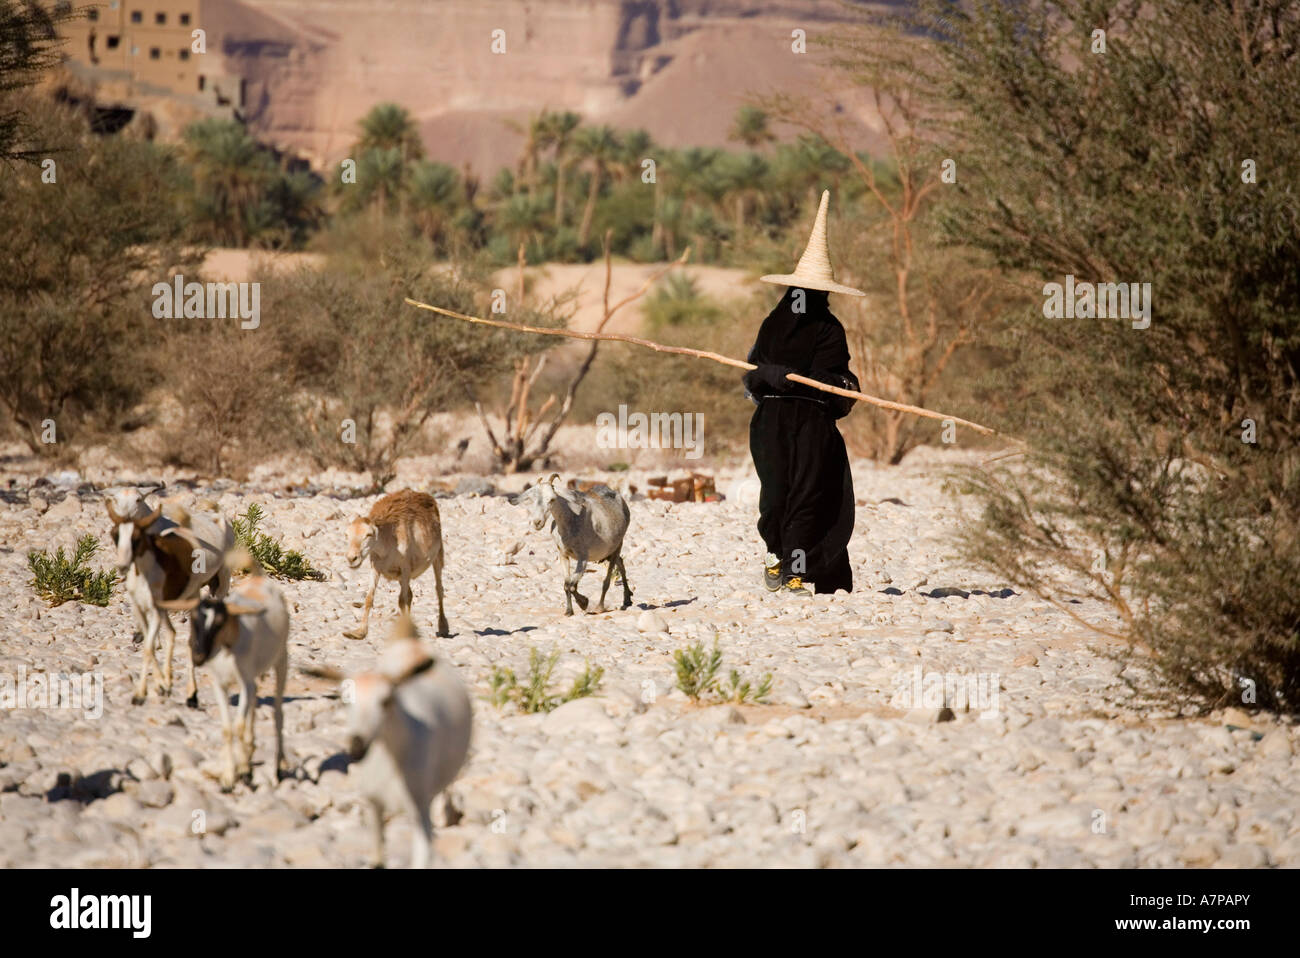 Woman wearing the traditional conical hat, Al Hajjarin Village, Wadi Dawan, Yemen - Stock Image